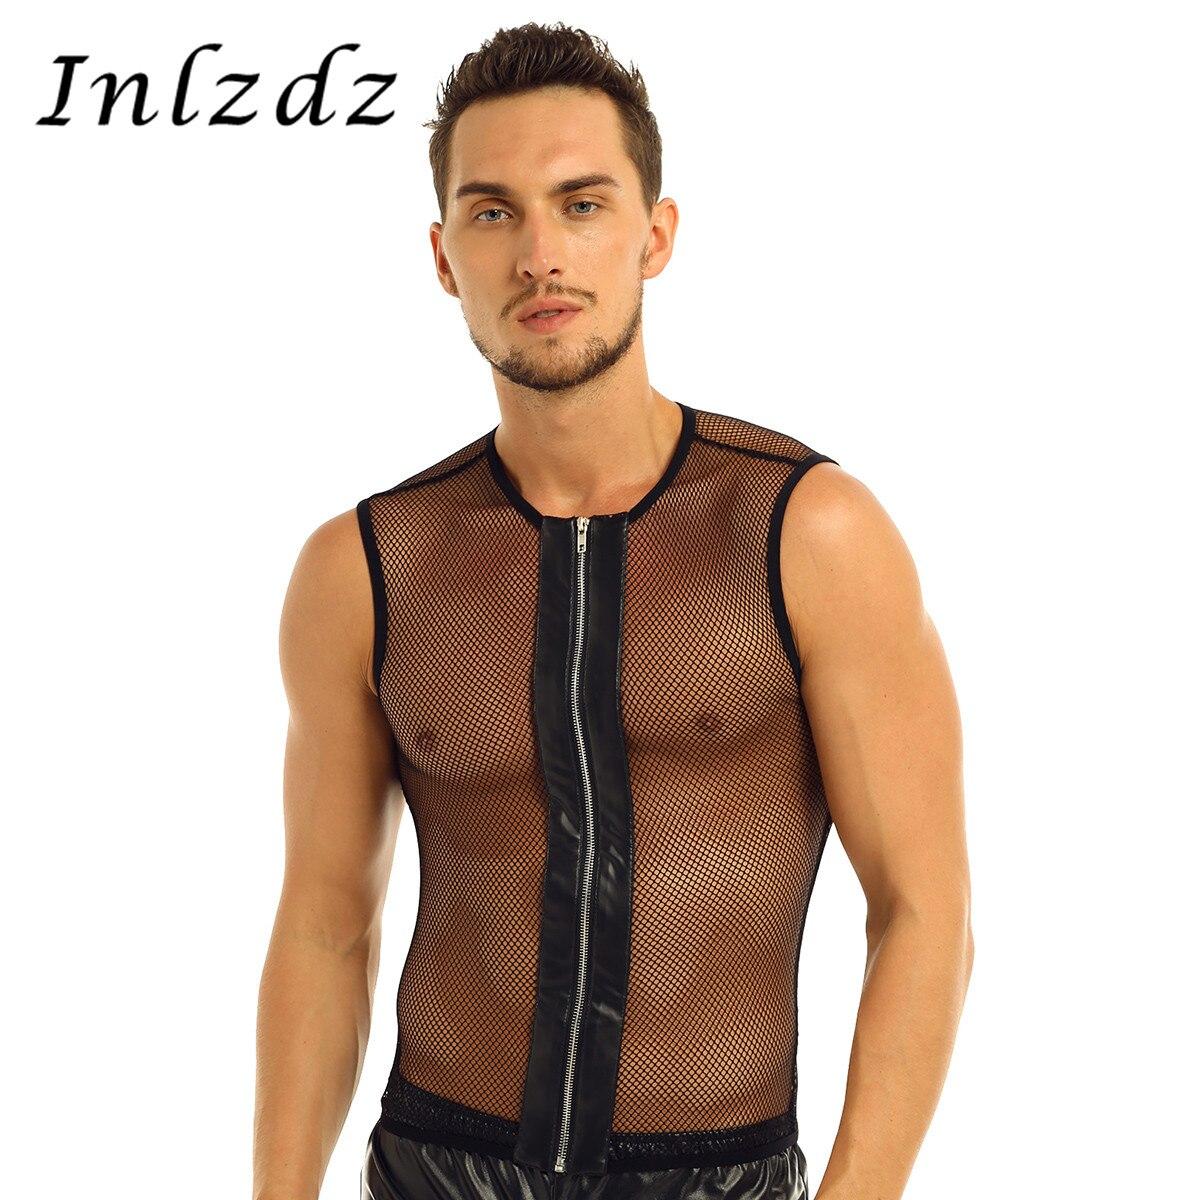 Harness Mens Lingerie Mesh Tank See-through Sex Homme T-Shirts Mesh Fishnet Zipper Muscle Transparent Body Suit Tank Top T-Shirt